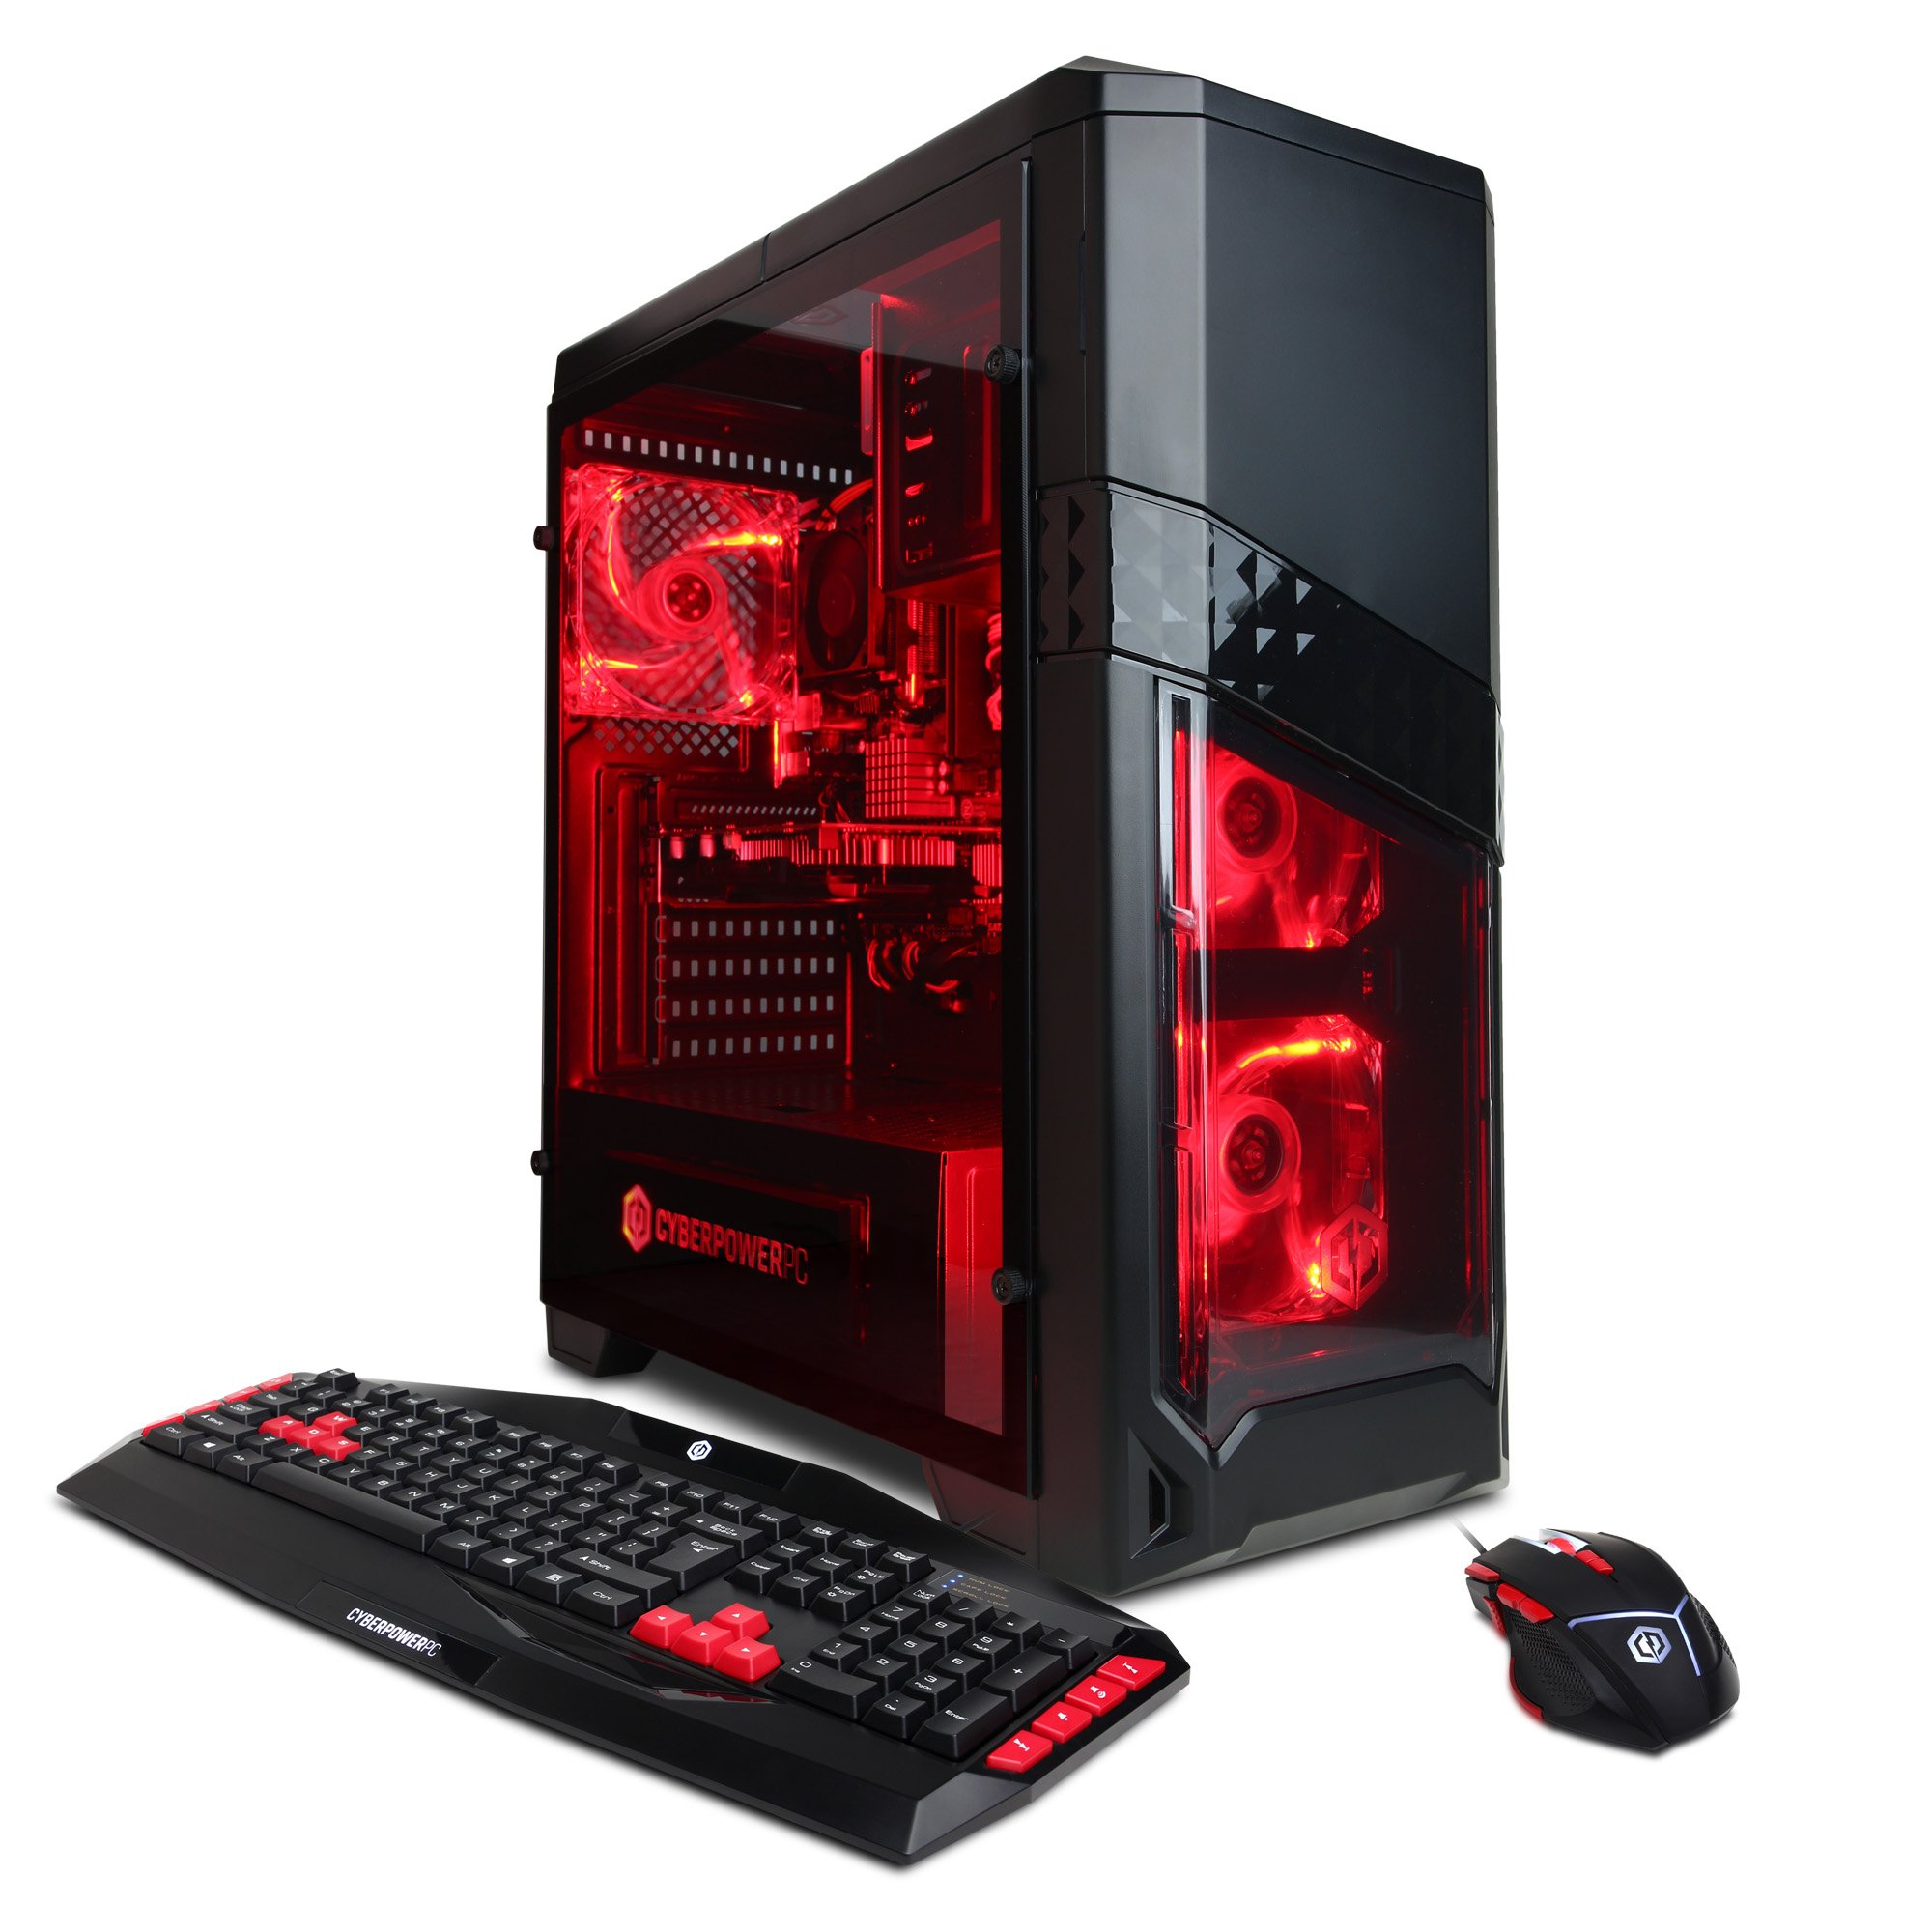 CYBERPOWERPC Gamer Ultra GUA3120A w/ AMD FX-4300 3.8GHz CPU, 8GB DDR3, AMD R7 250 2GB, 1TB HDD, 24X DVD+-RW & Win 10 Home 64-Bit Desktop Gaming PC